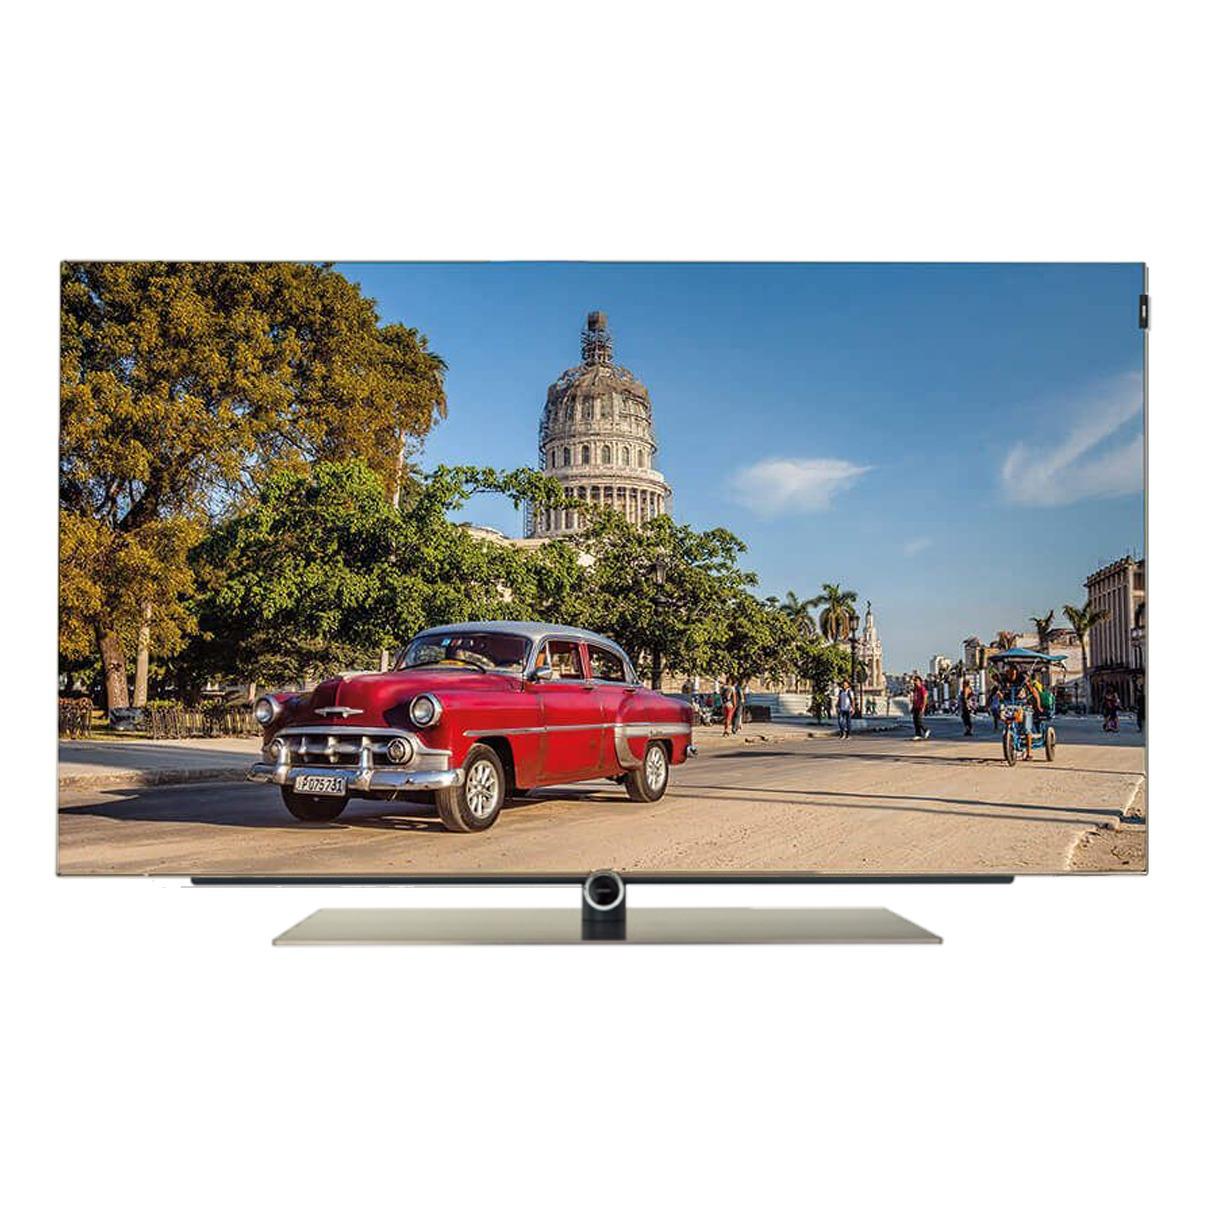 Loewe Bild 5.65 OLED 65 inch OLED TV